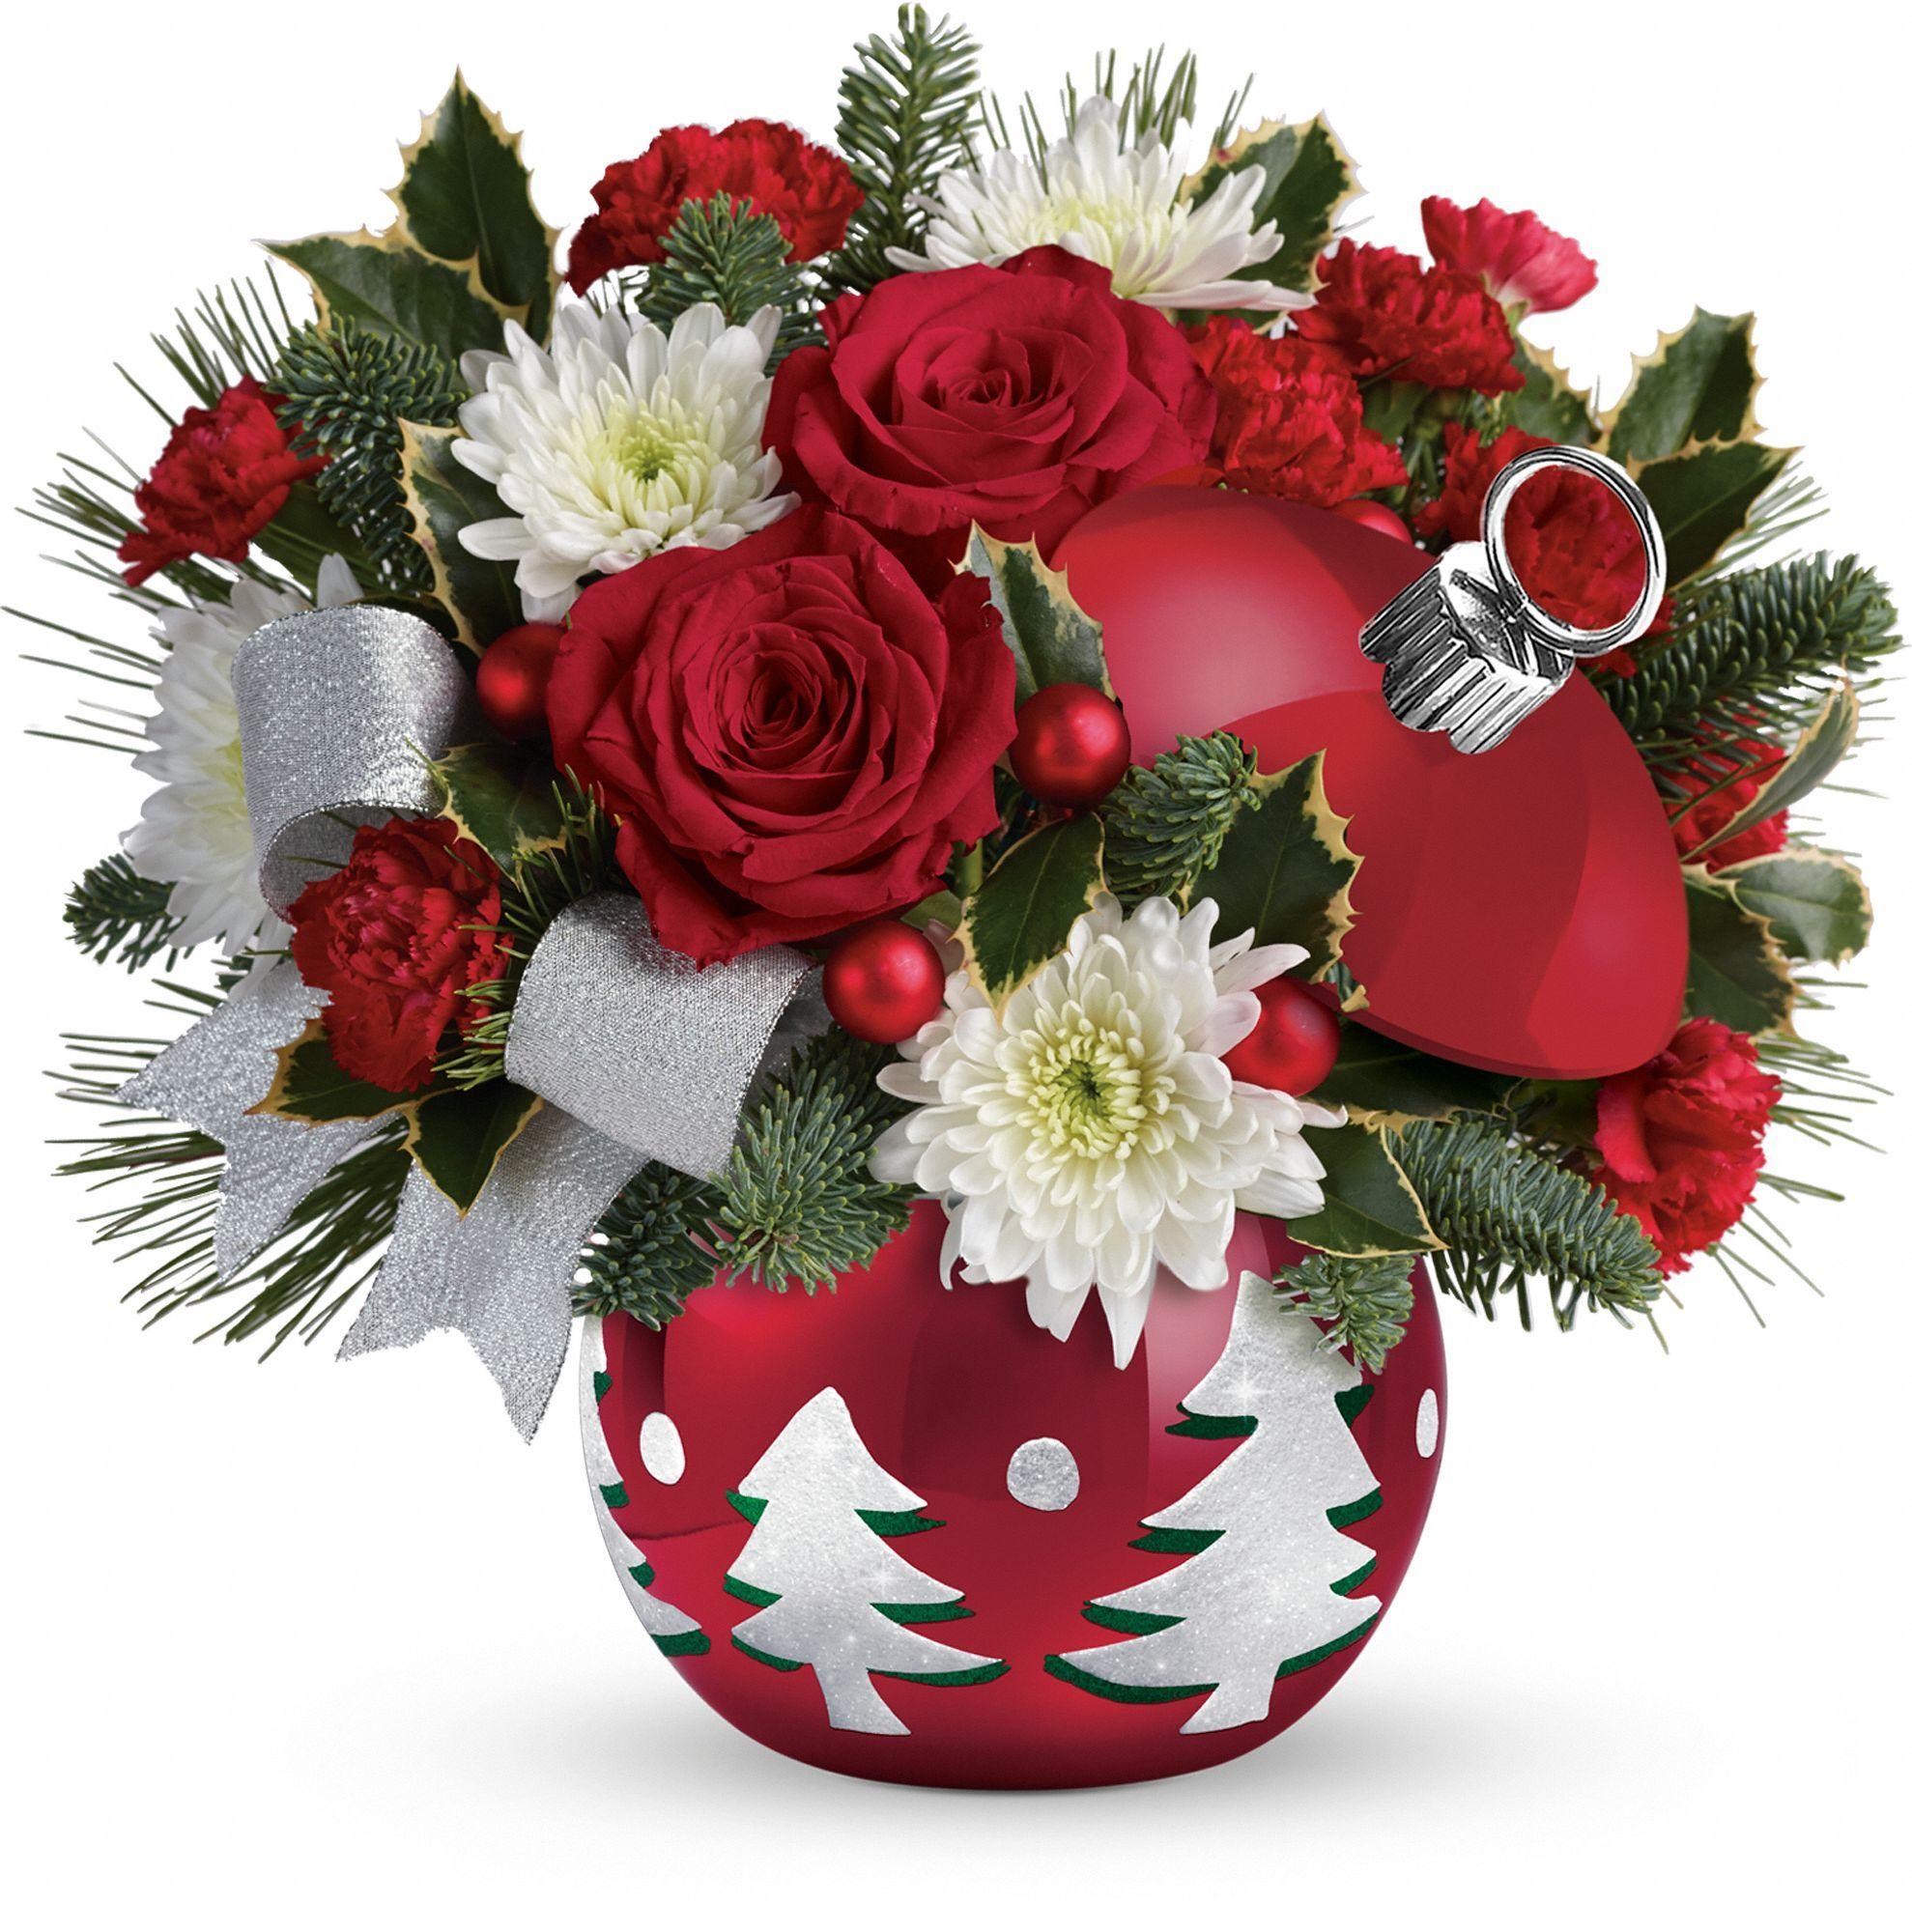 Teleflora's Sparkling Winter Wonderland Christmas flower